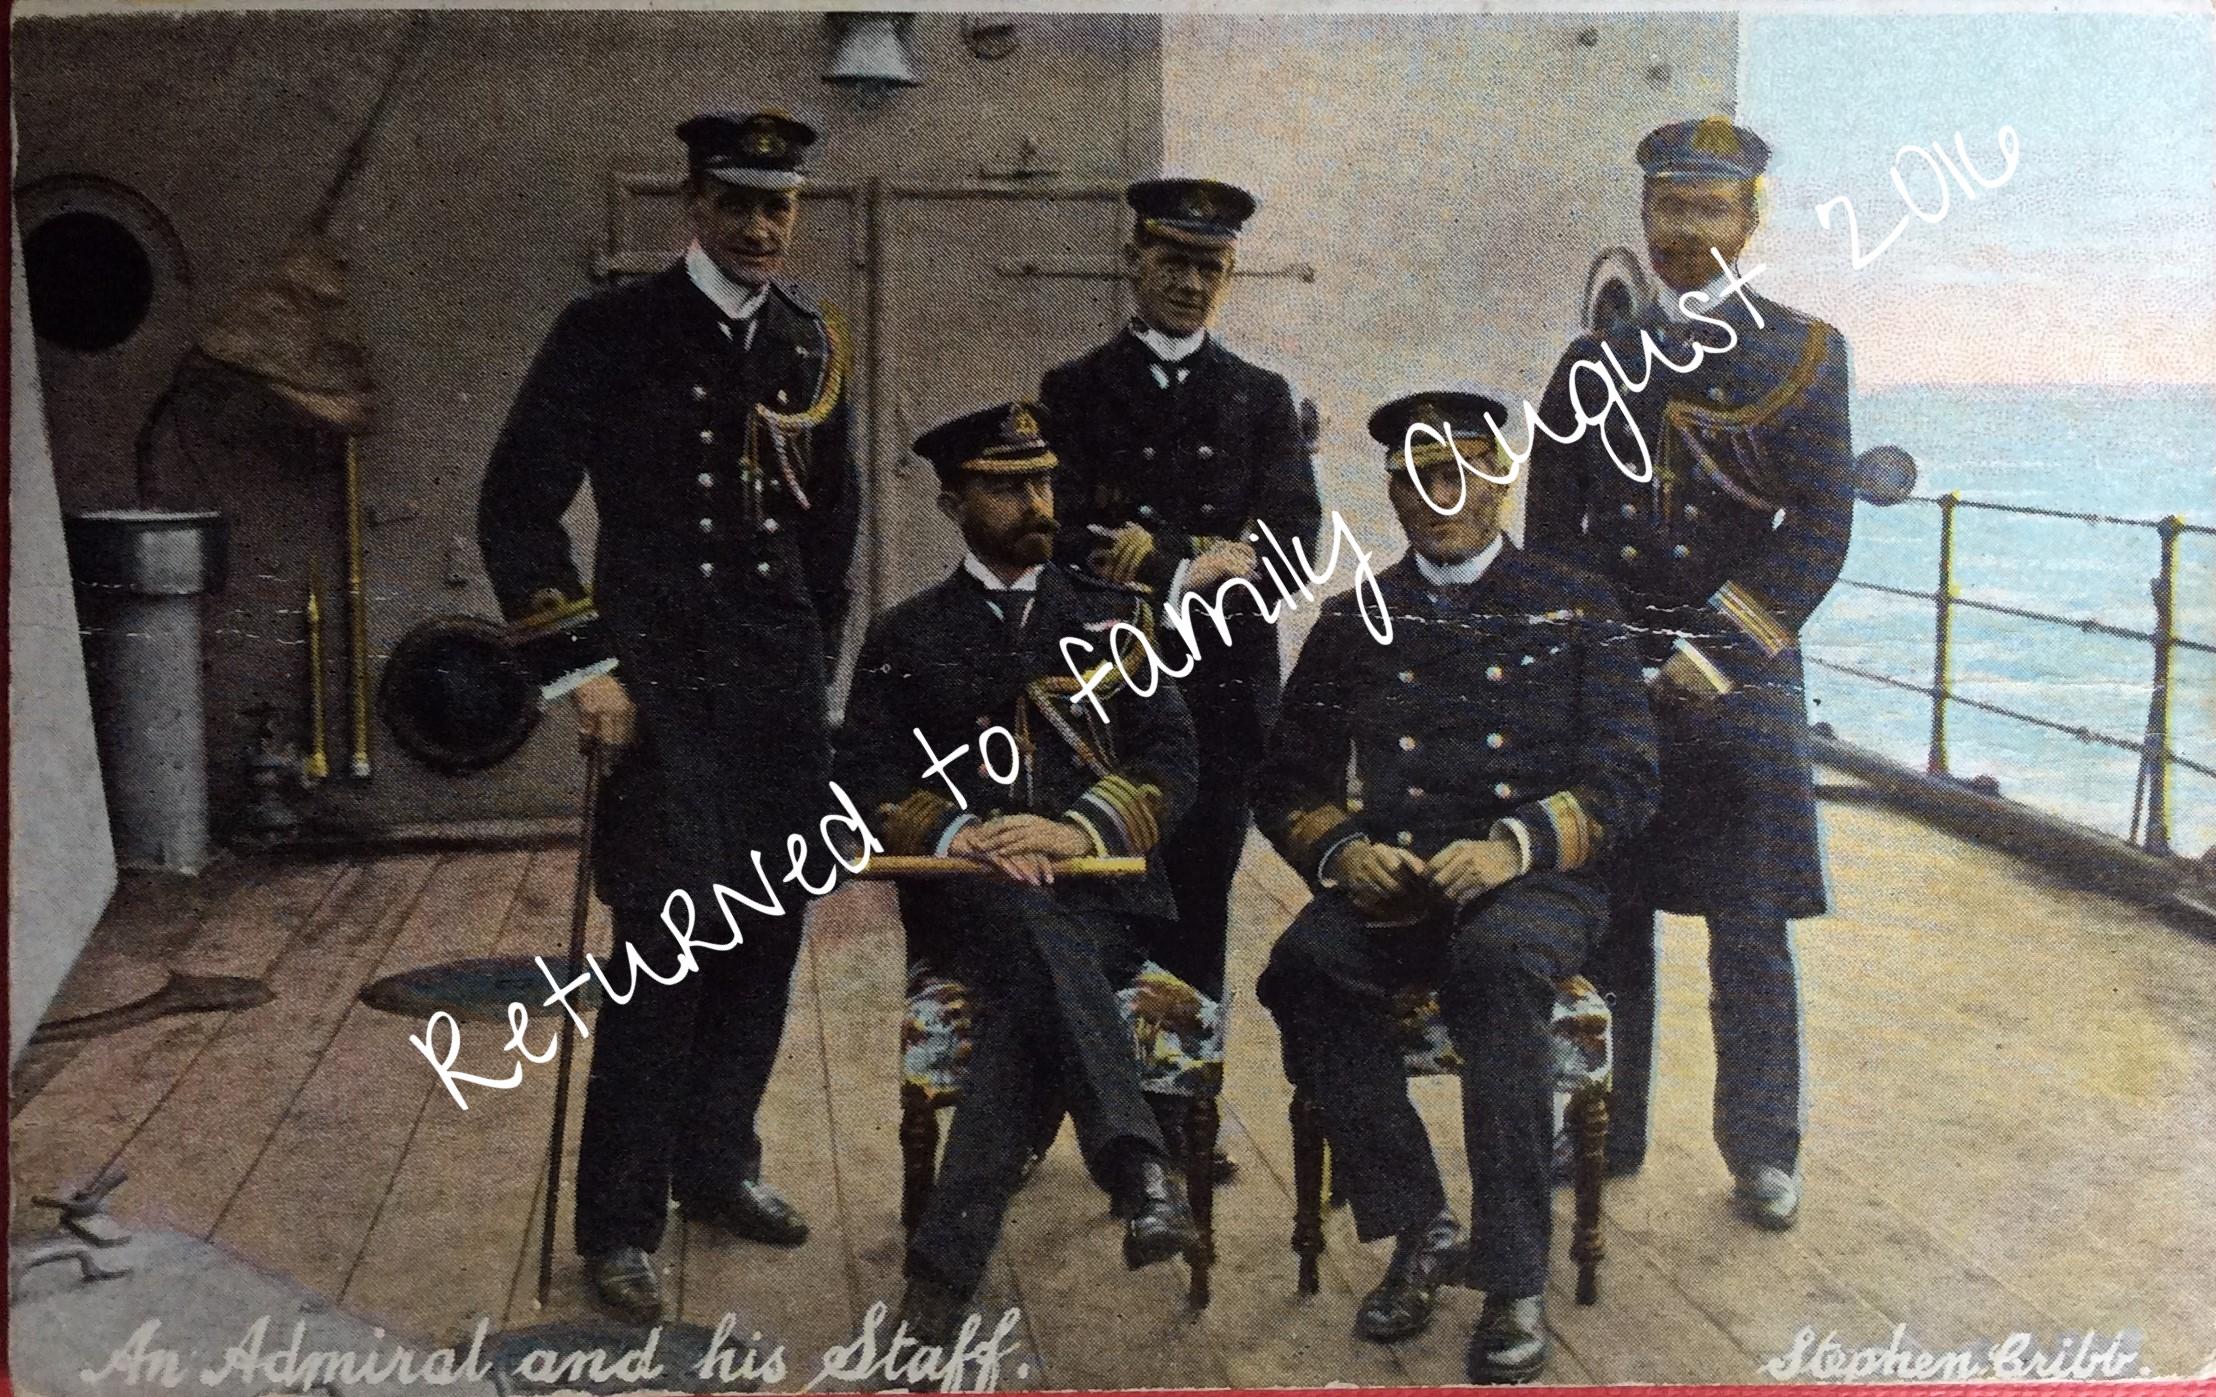 1906 A naval man from Audenshaw